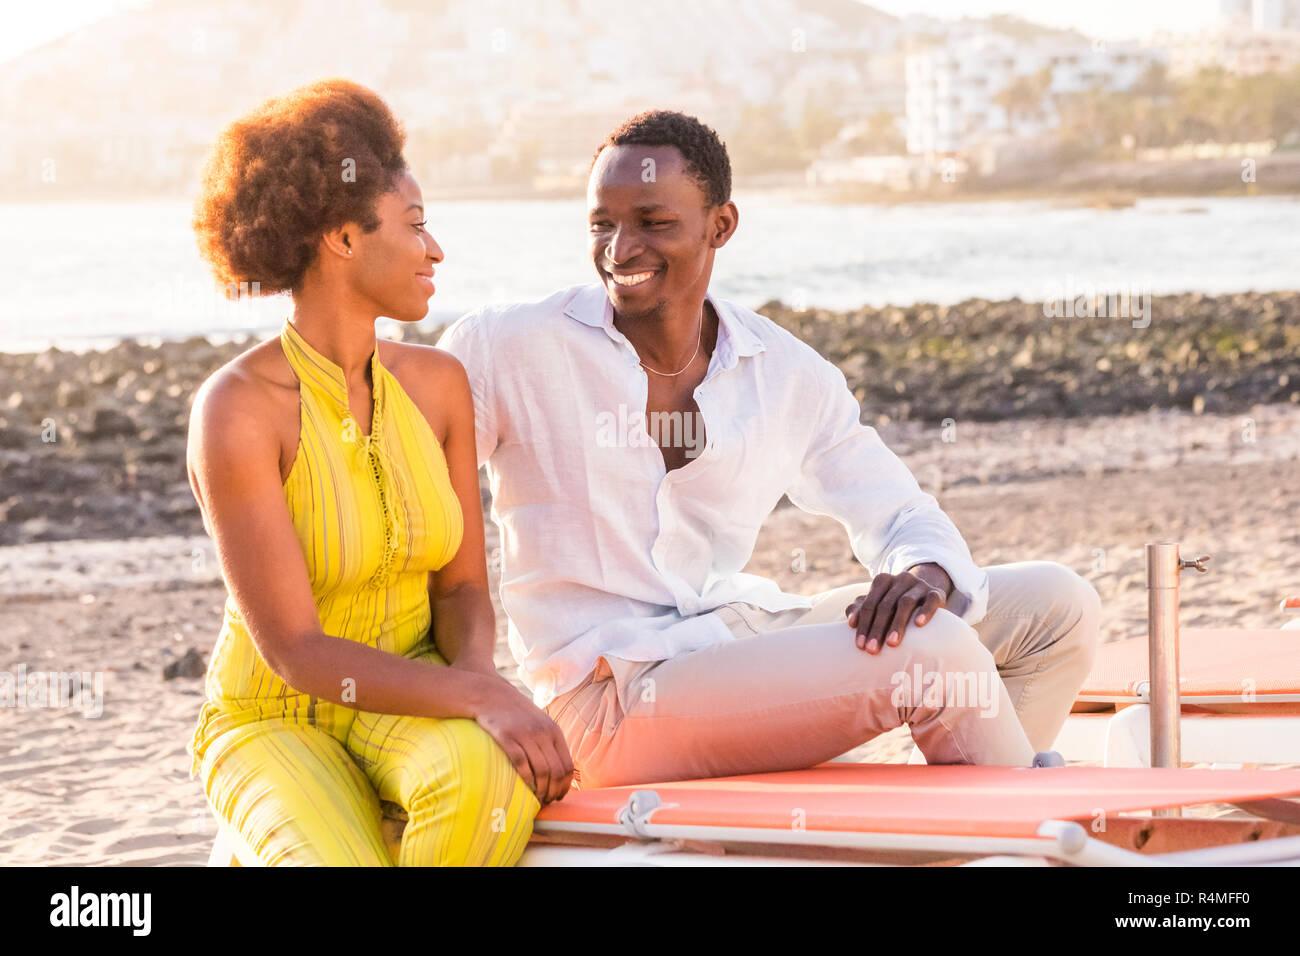 Women african dating american men african White Men